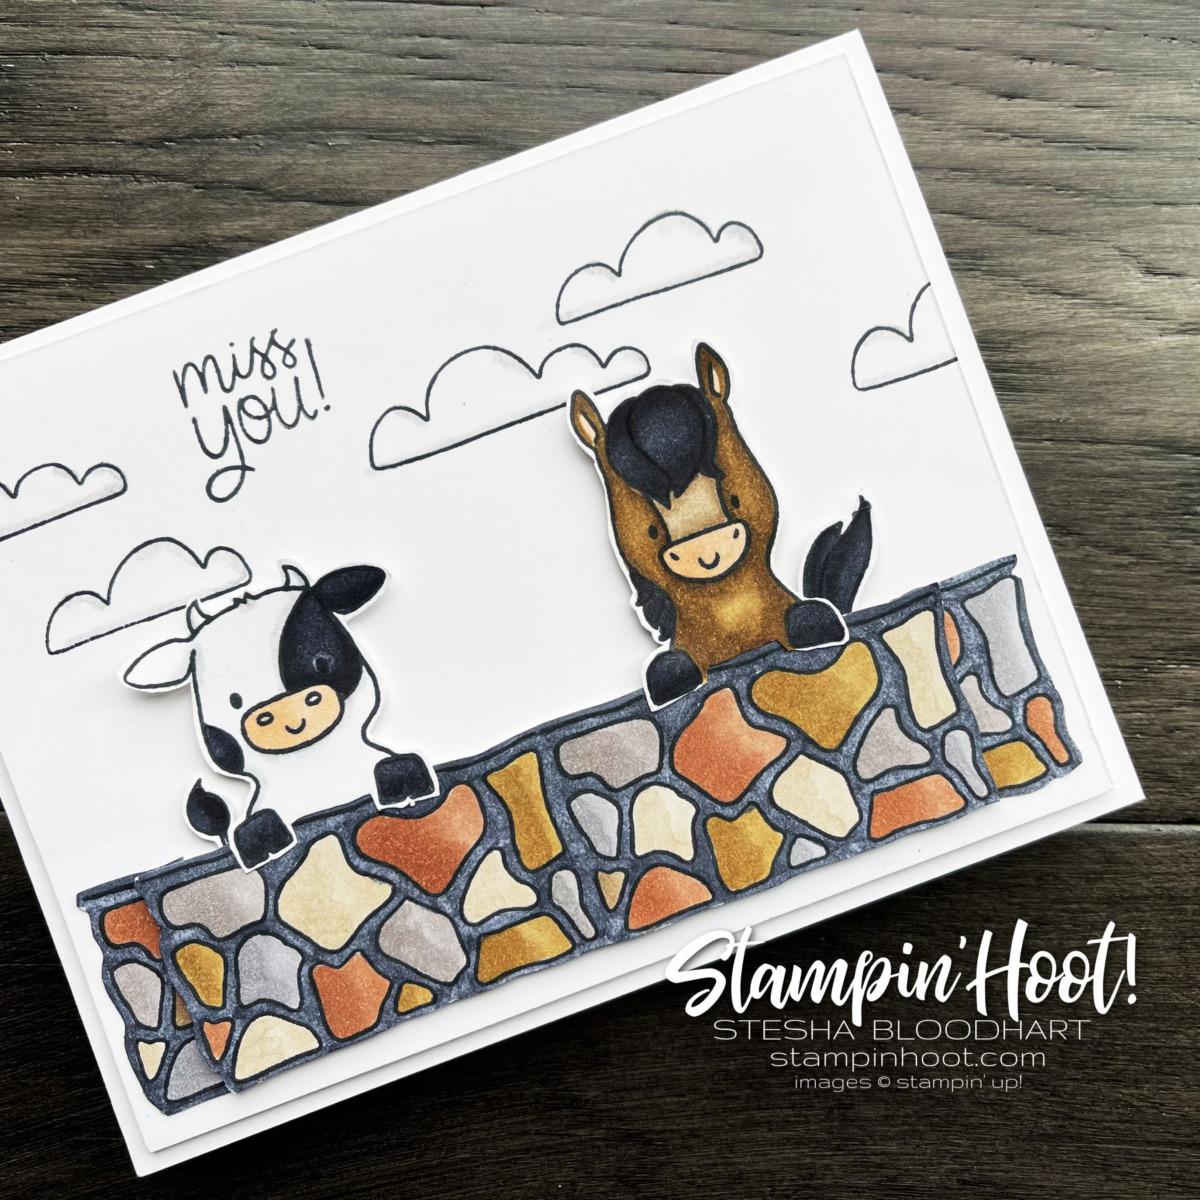 Miss You Card using Stampin' up! Peekaboo Farm. Card by Stesha Bloodhart Stampin' Hoot #tgifc317